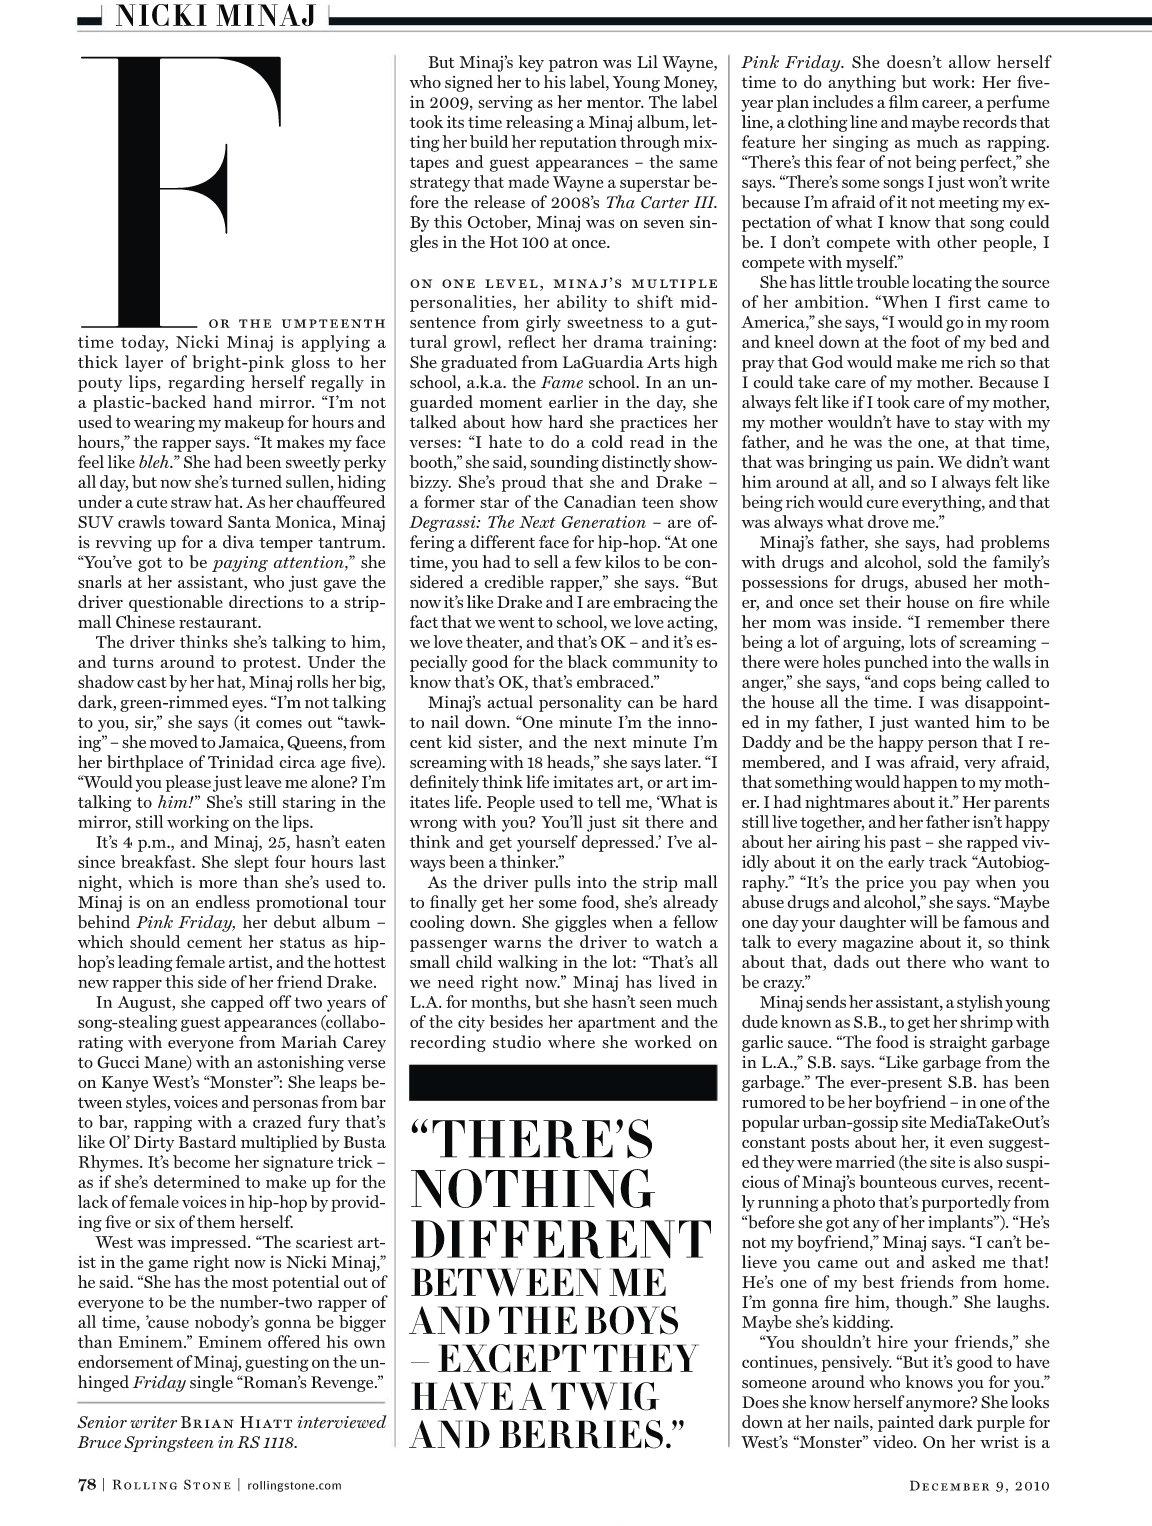 December 2010 Issue